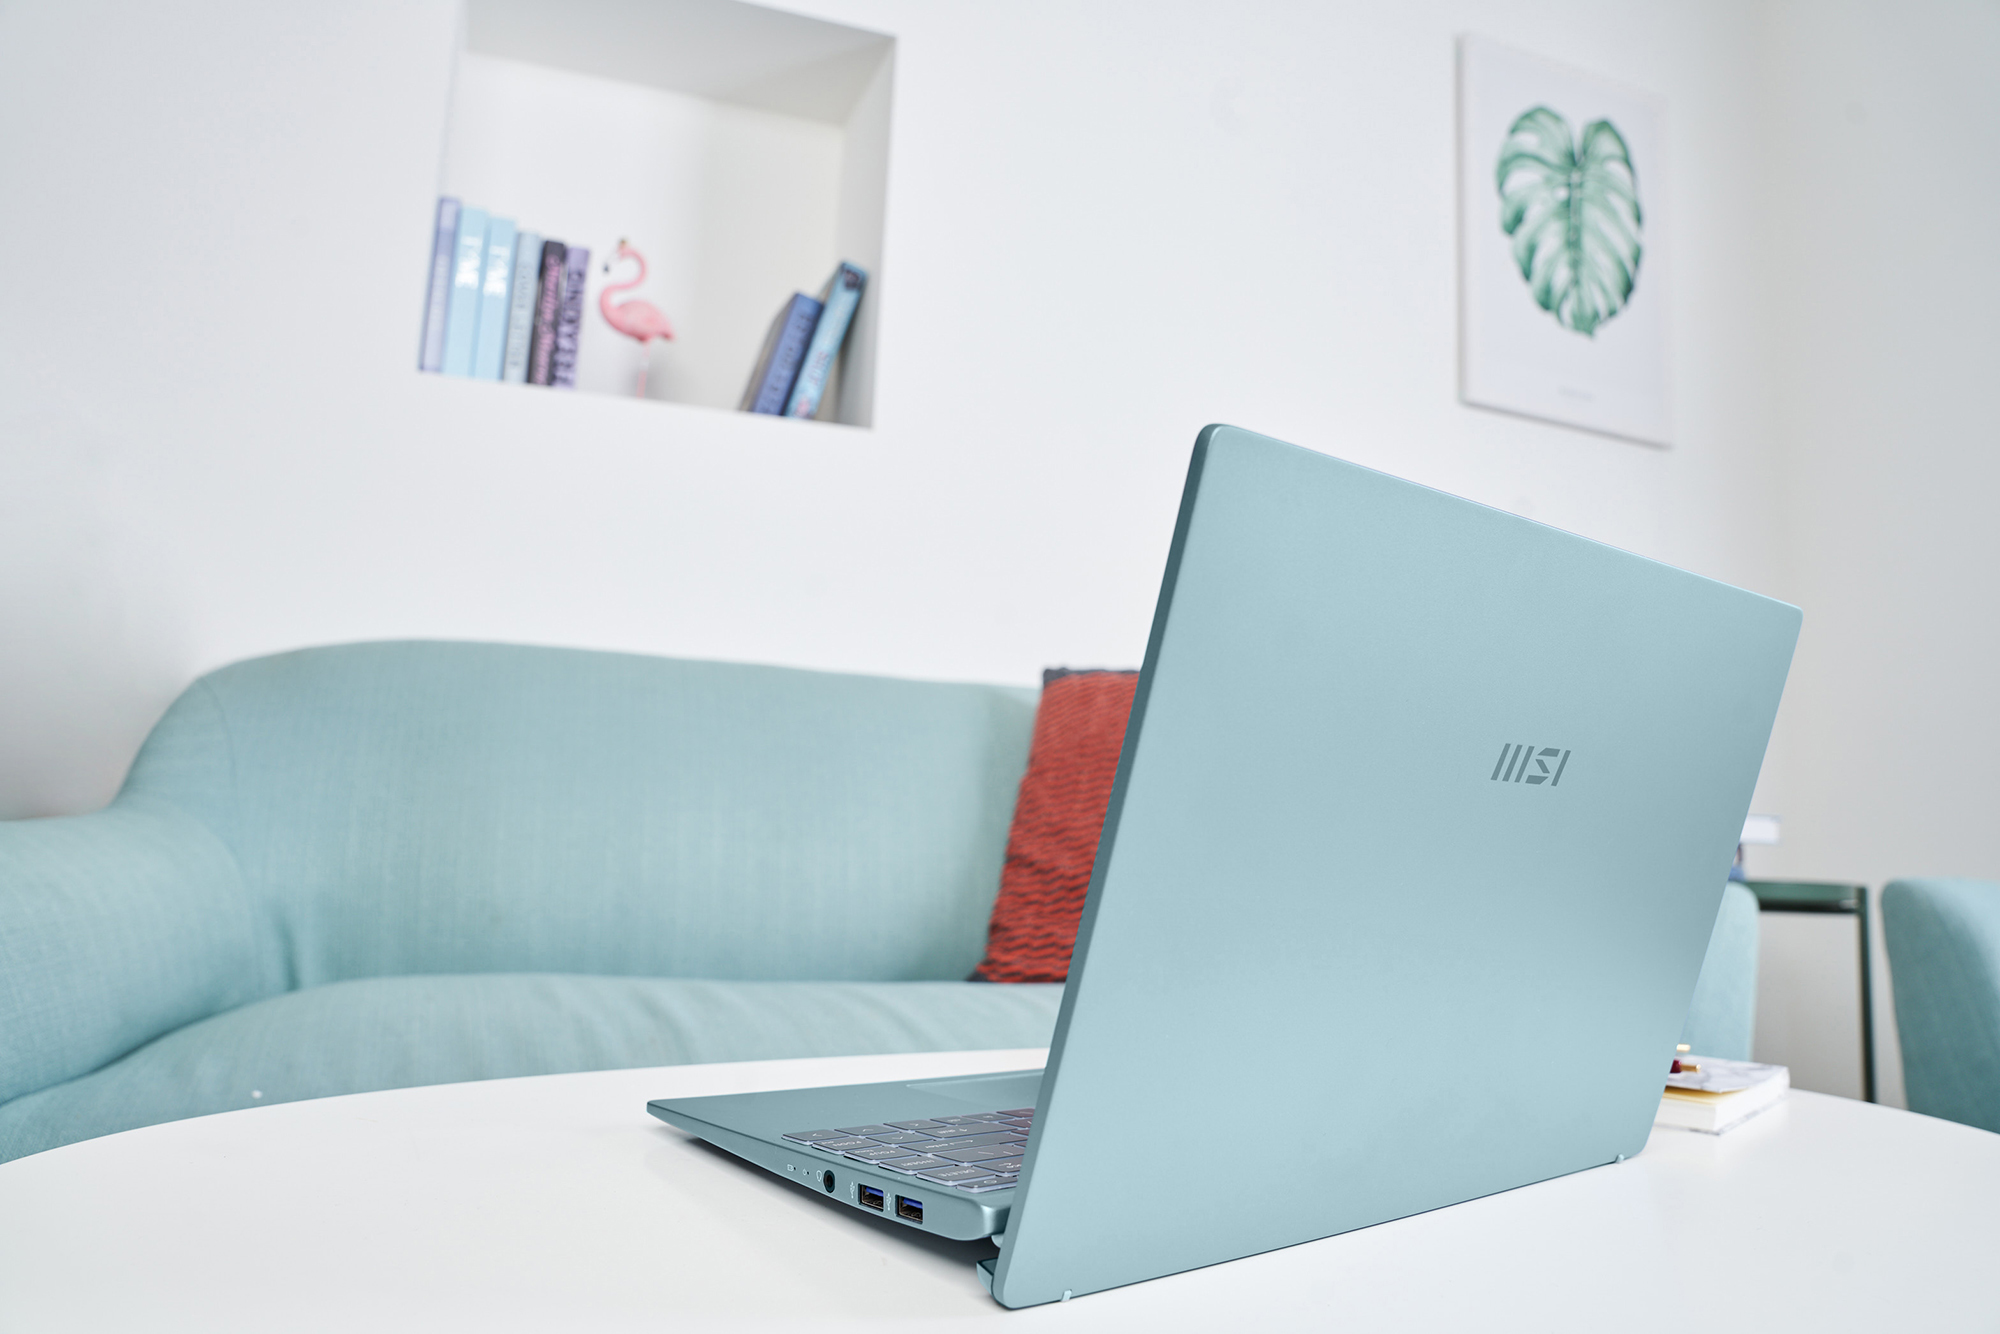 notebook手提電腦推介,筆記型電腦文書機-青石藍|MSI 微星香港 Modern 14 系列